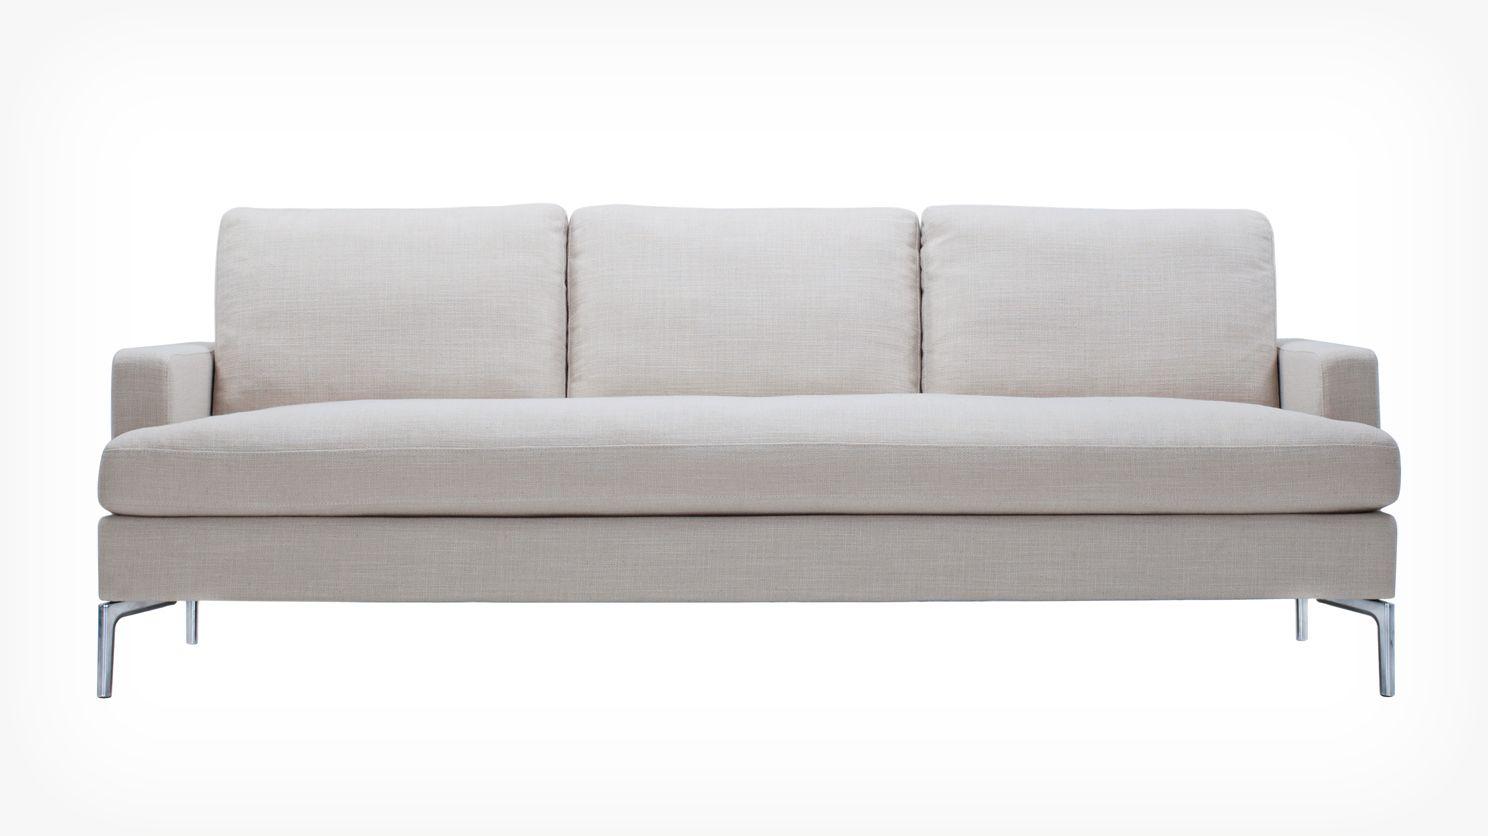 down sofas canada sectional lounge sofa eq3 remi loveseat reviews wayfair ca thesofa